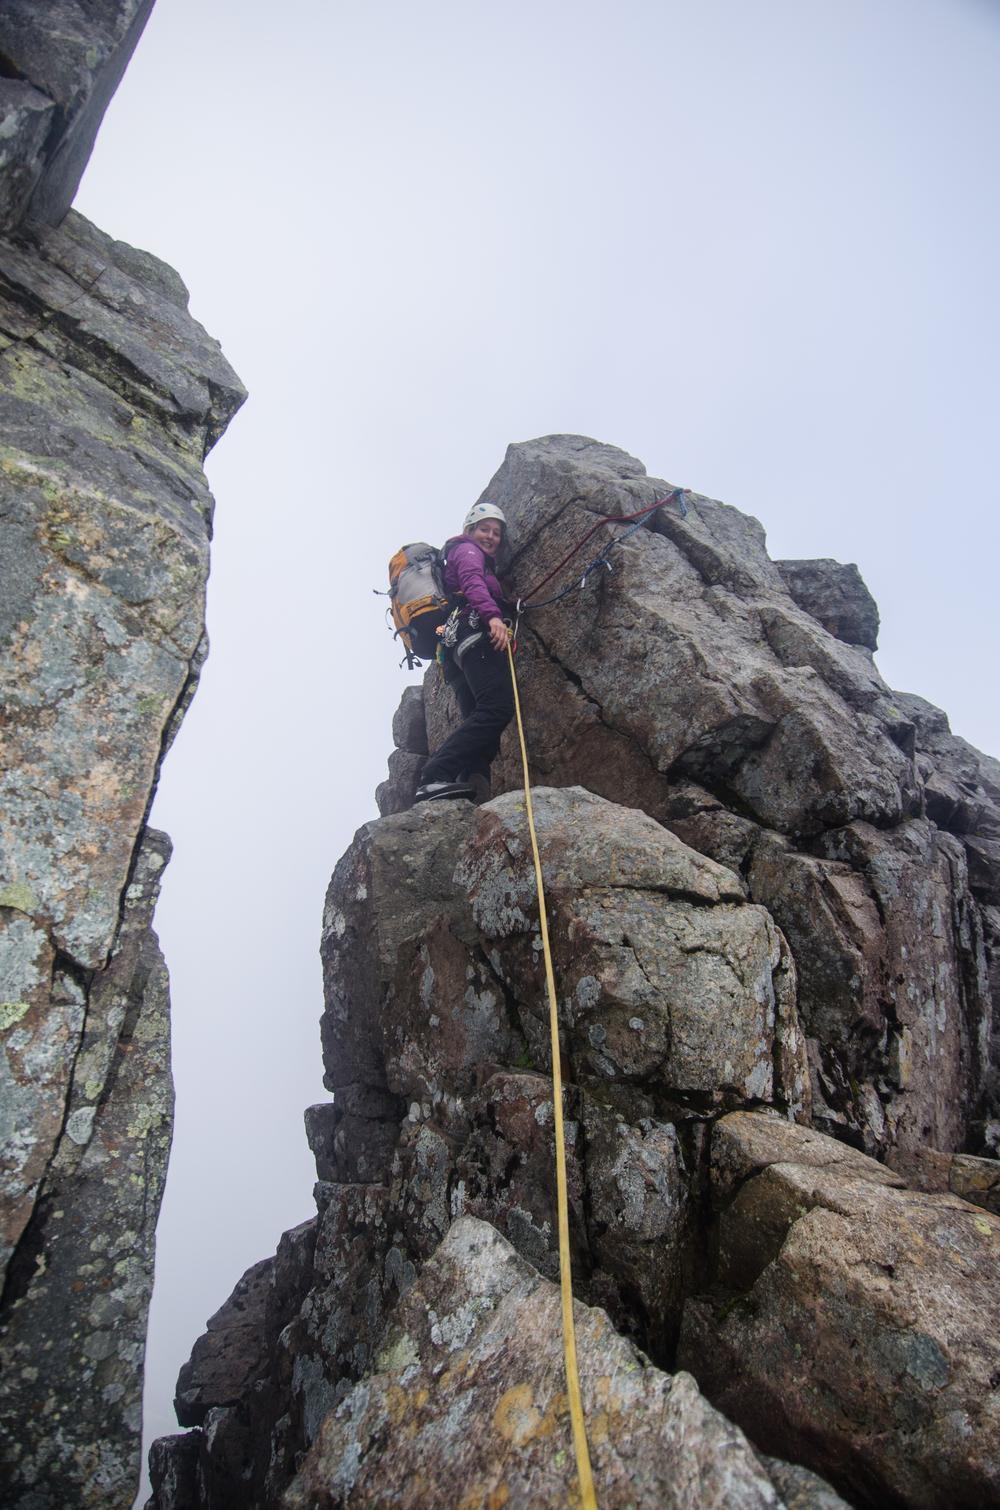 Descending into Tower Gap